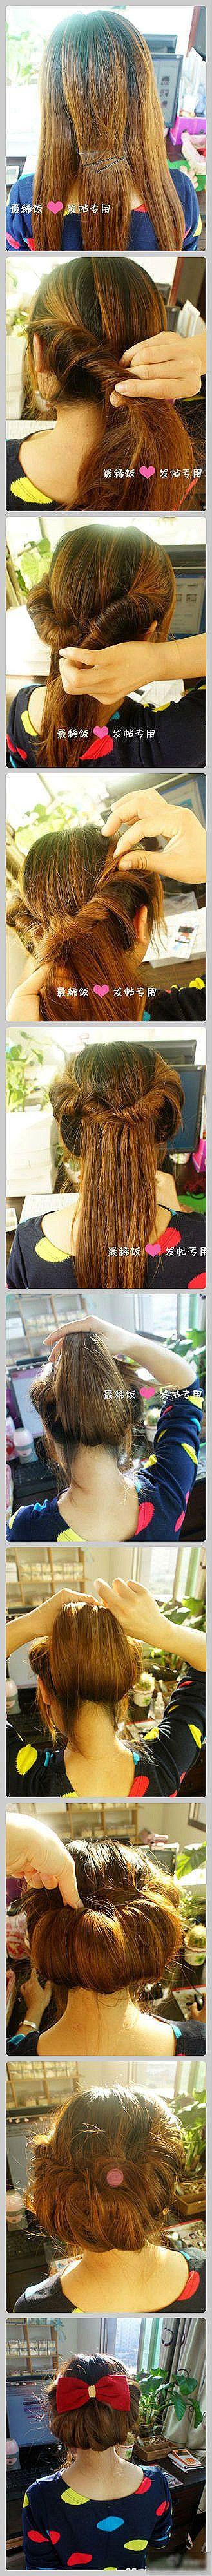 hair style ideas for travel